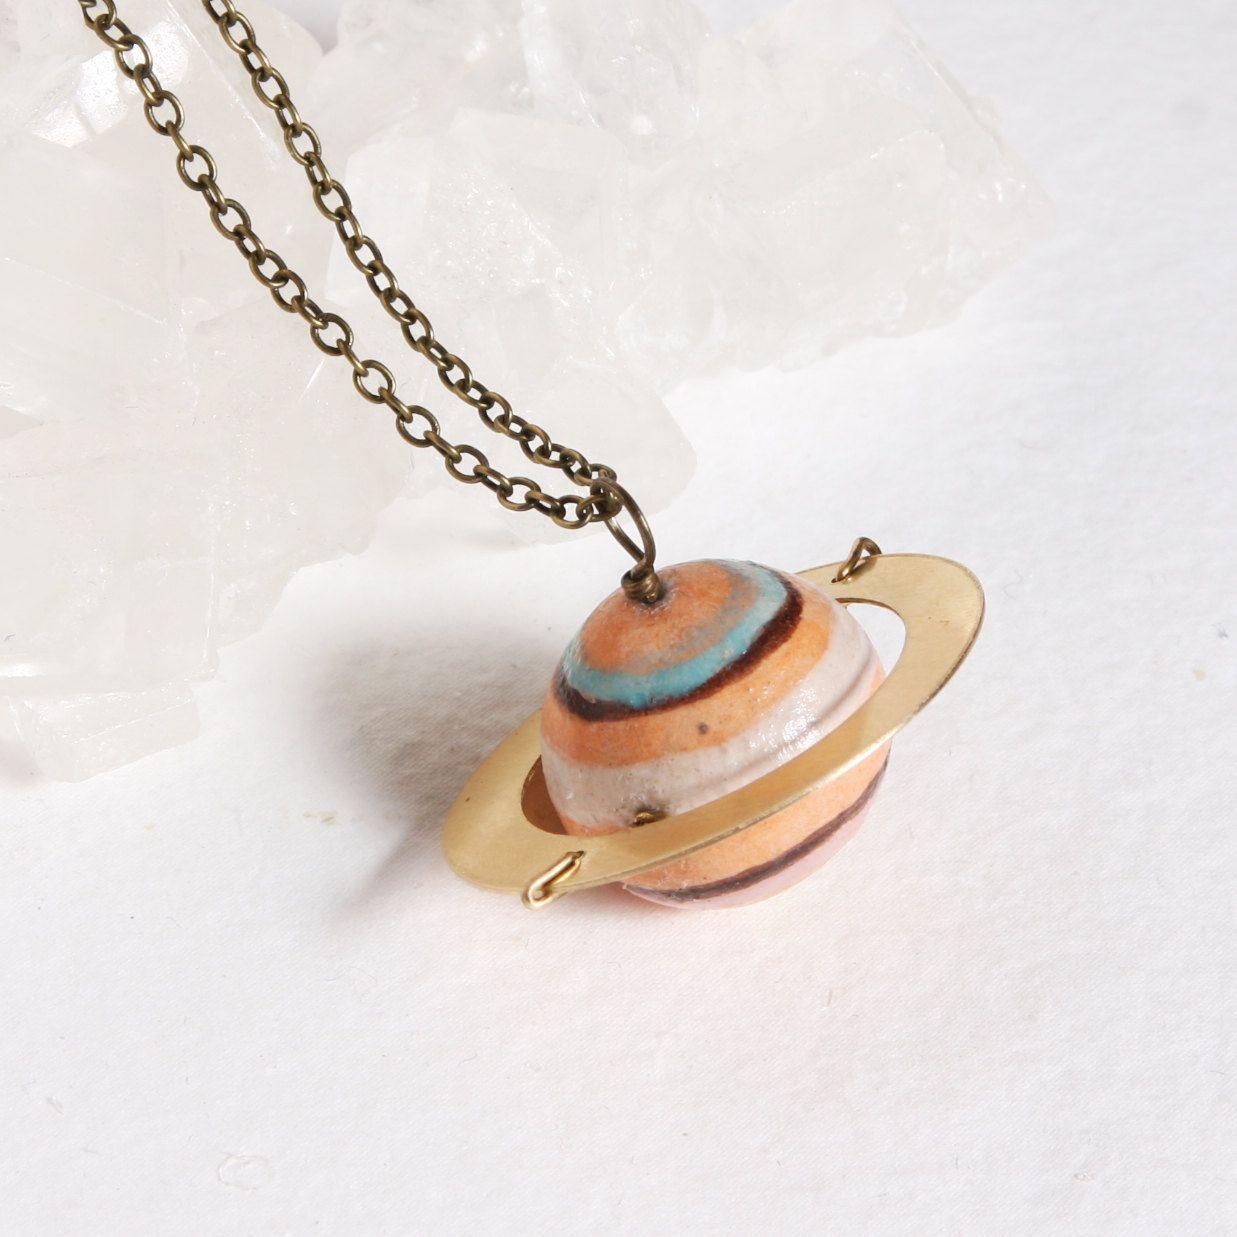 Planet Saturn Pendant Adjustable Necklace